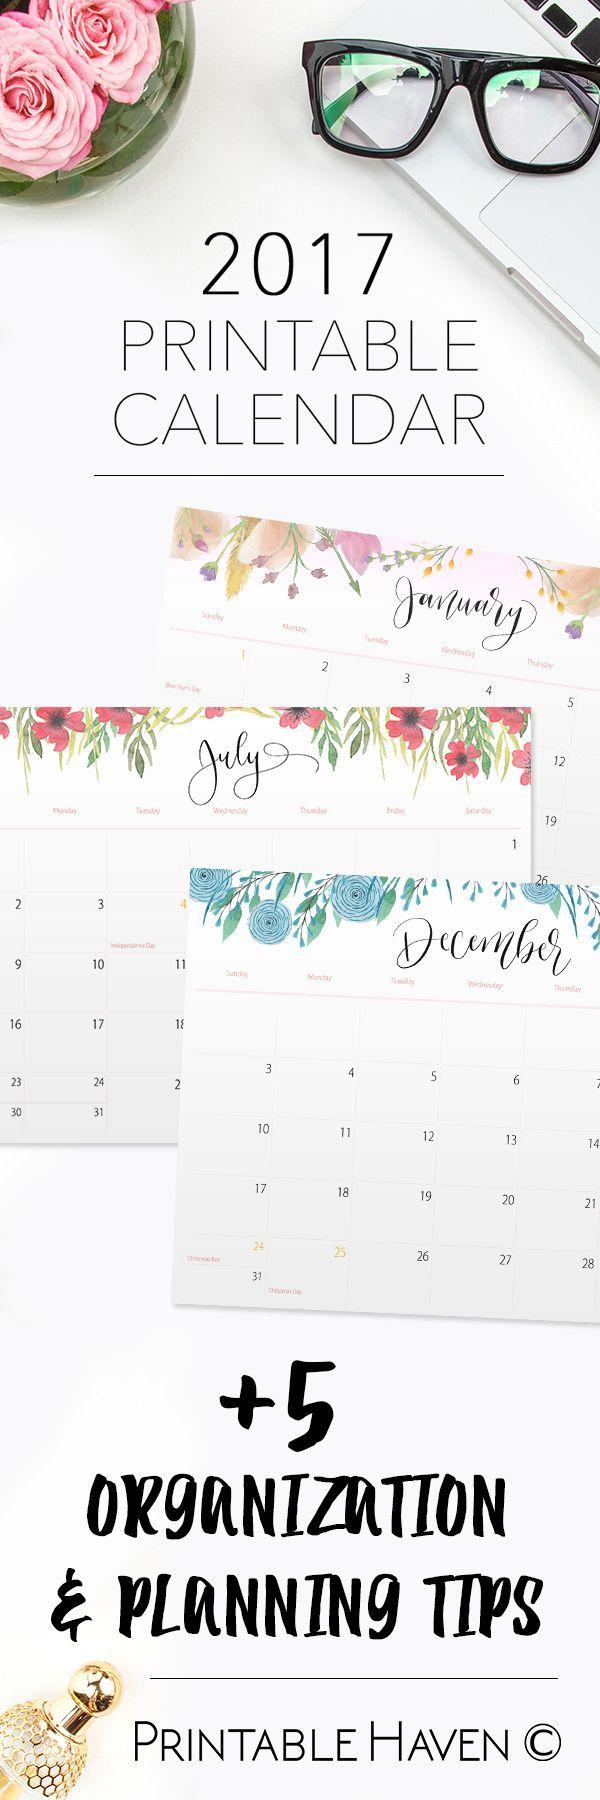 printable wall calendar 2017